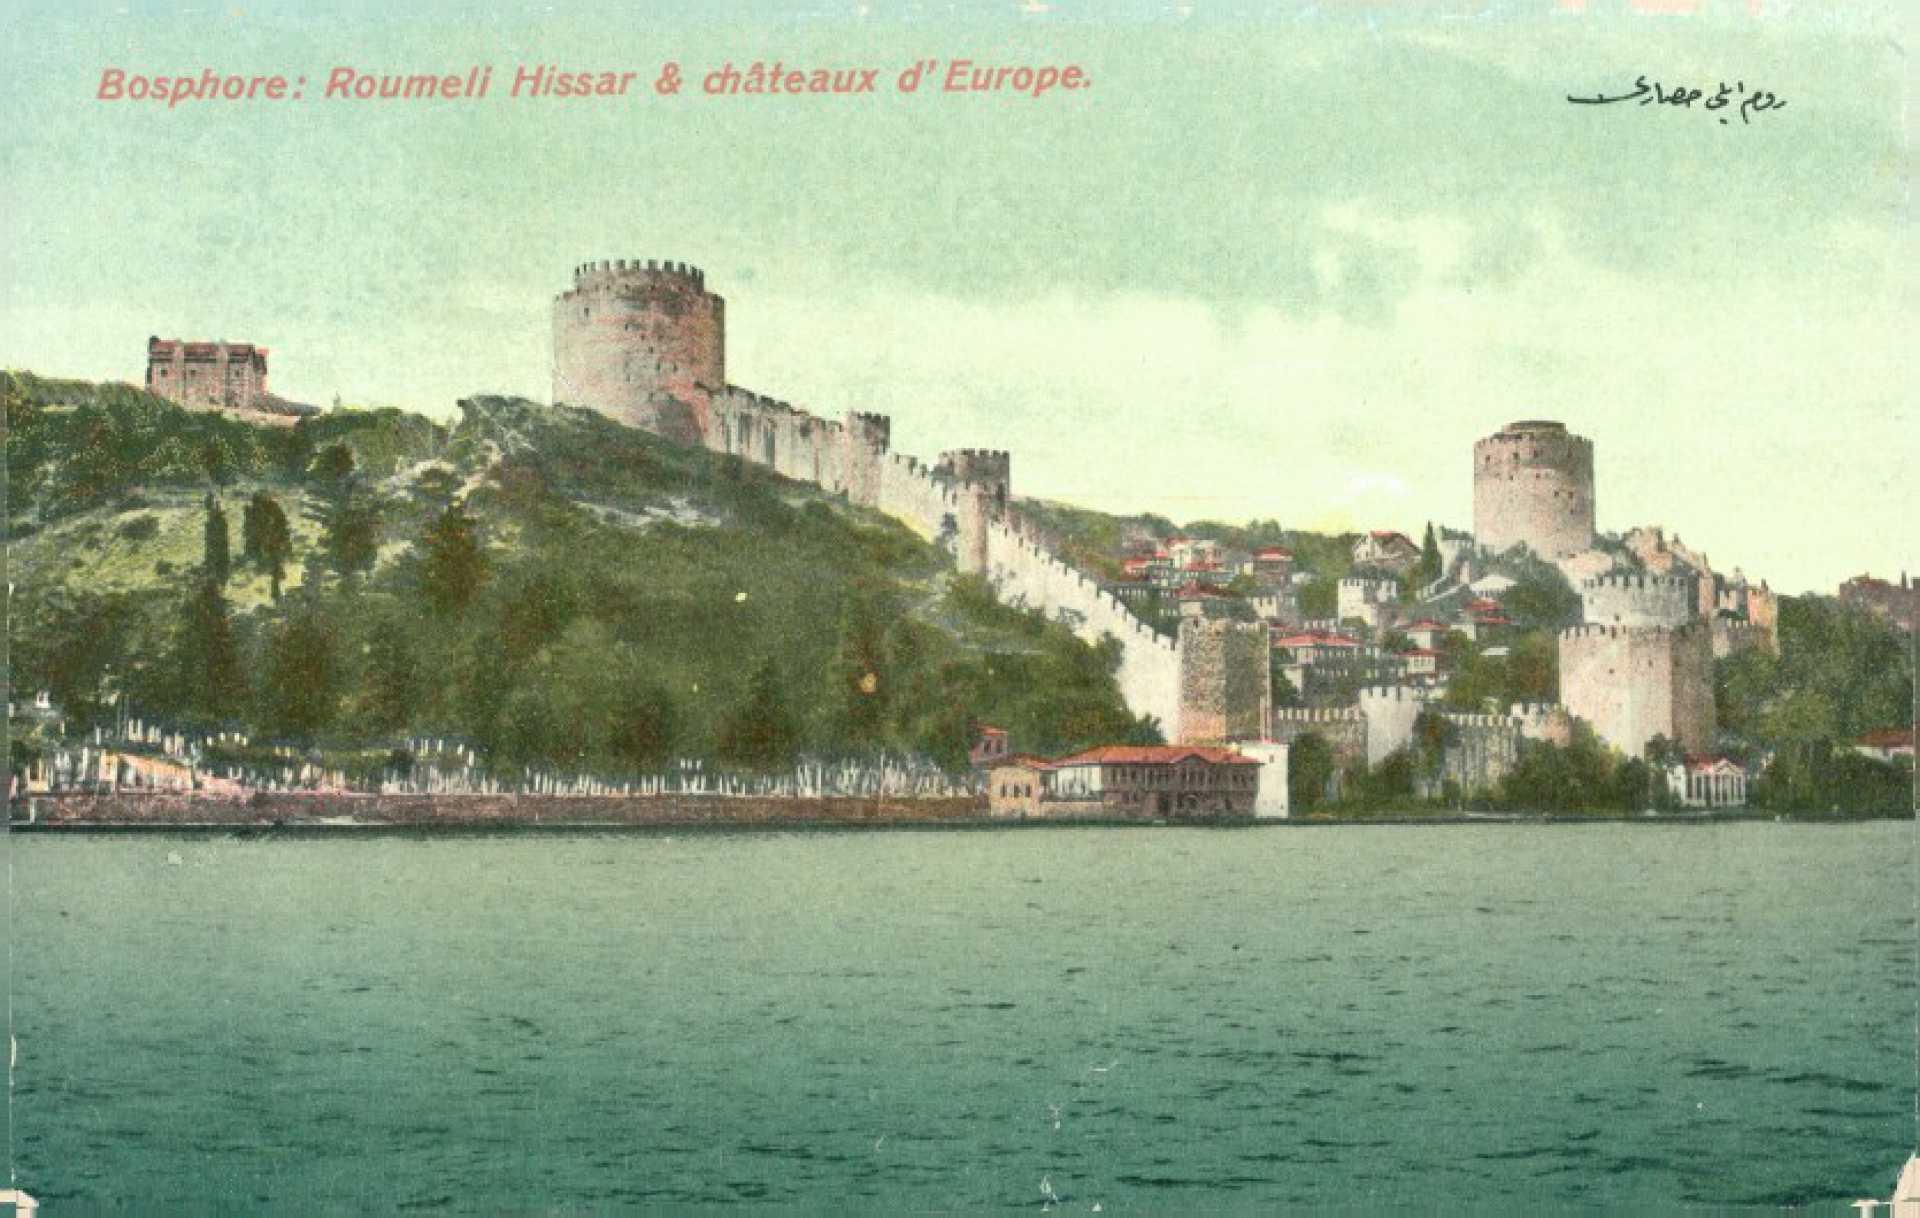 Bosphore: Roumeli Hissar & chateaux d'Europe